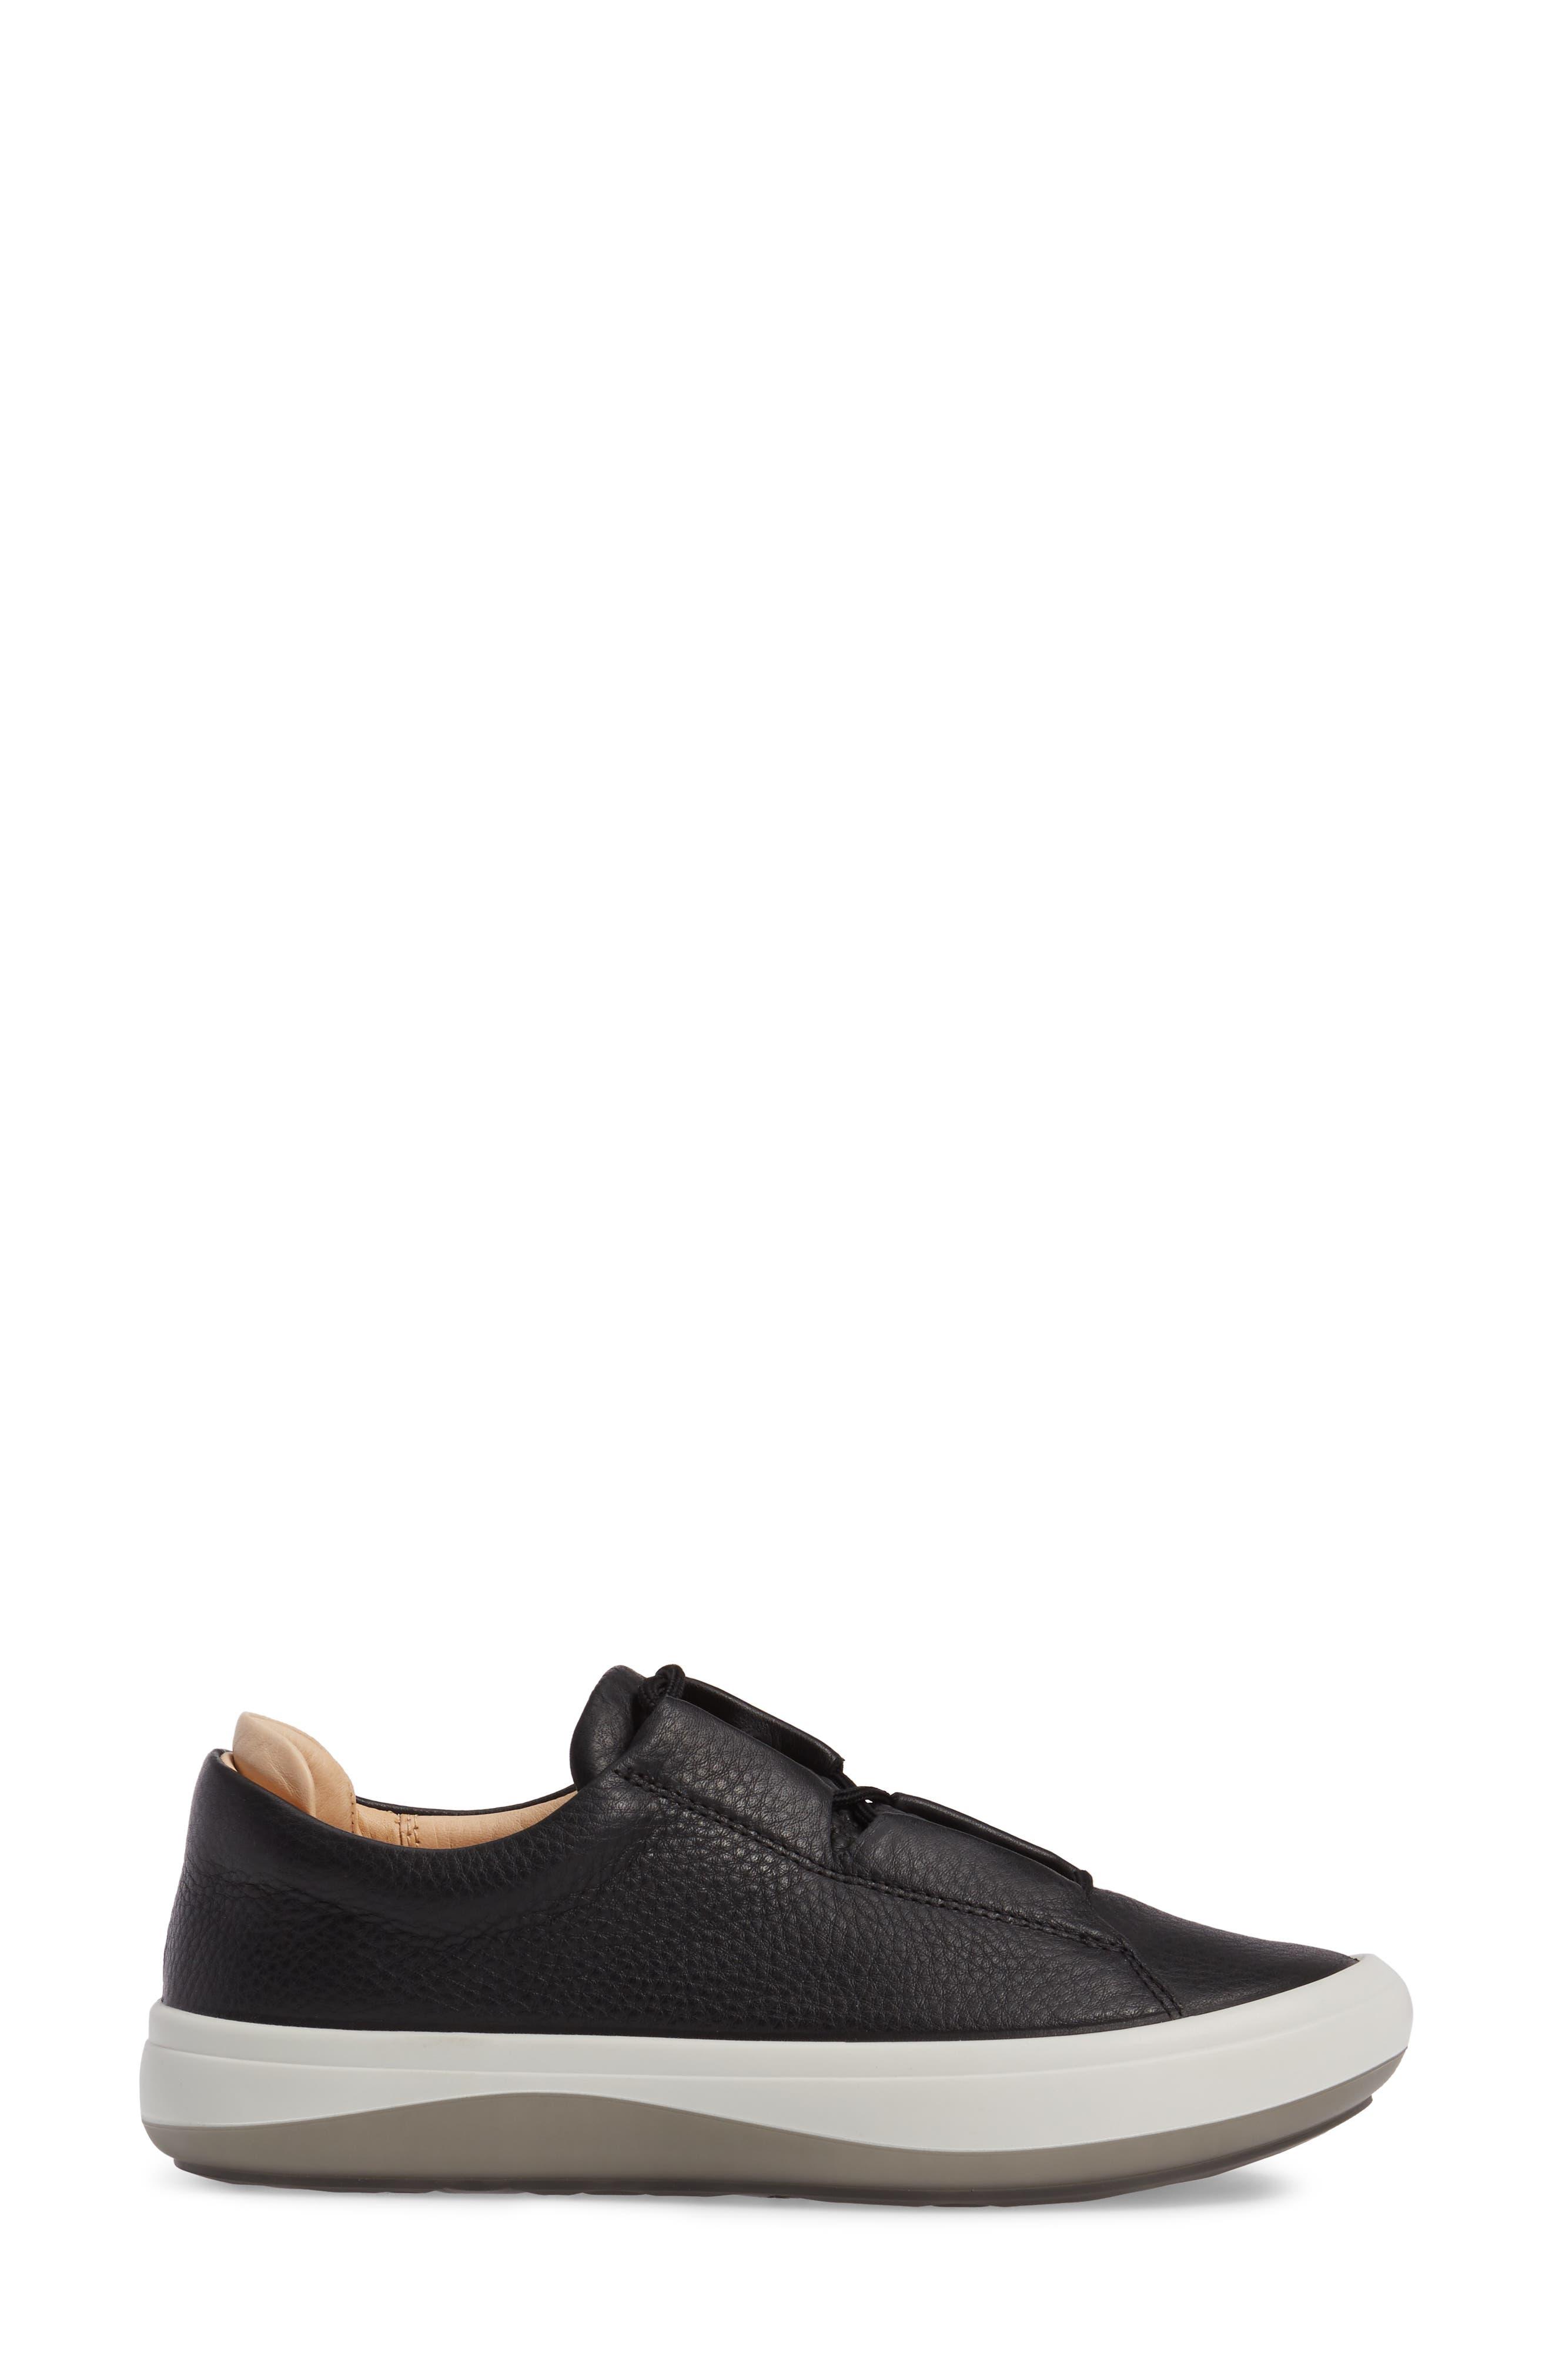 Kinhin Low Top Sneaker,                             Alternate thumbnail 3, color,                             013